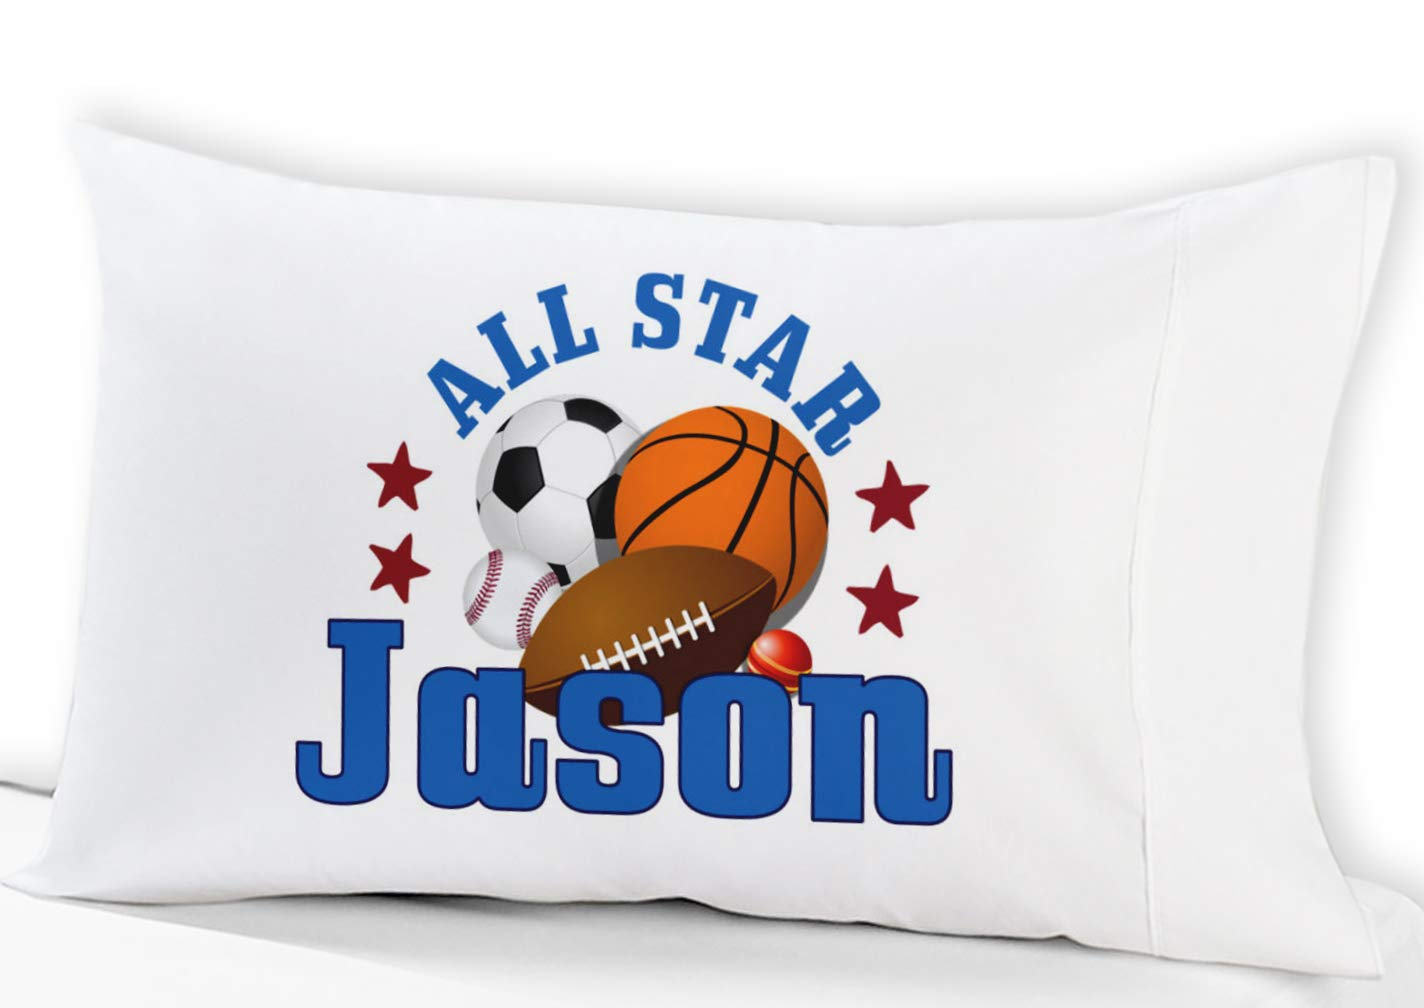 Personalized All Star Boys Sports Standard Pillowcase Fit Standard 19x26 Pillow Insert Baseball Basketball Football Soccer Ball Design (Standard) Stocking Factory PCASE-KIDS-ALLSTAR-STD-PERS